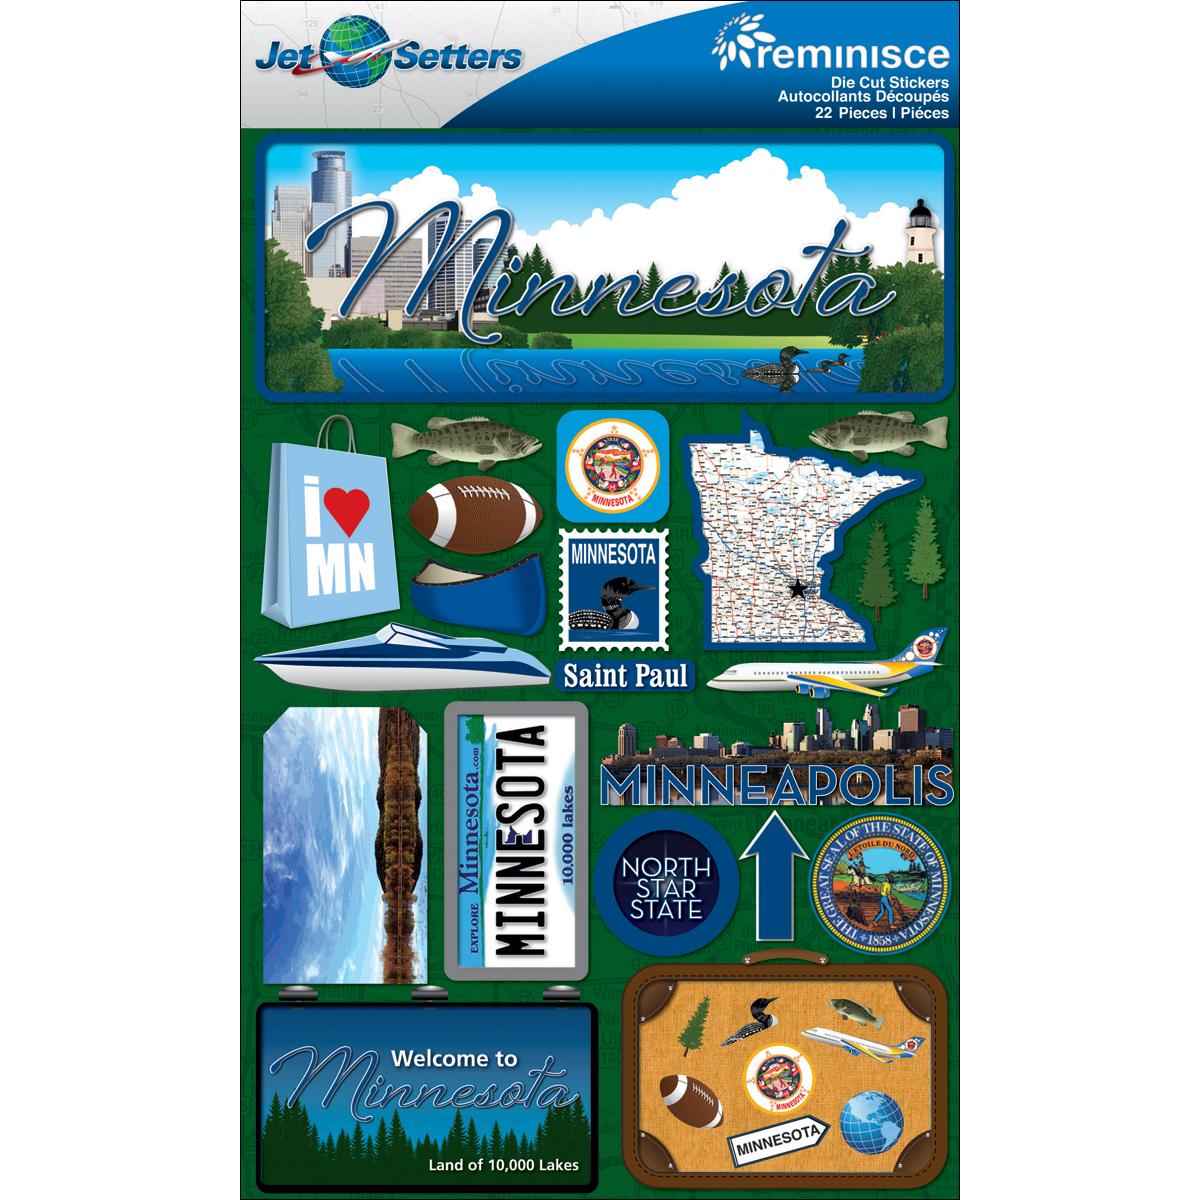 Minnesota - Reminisce Jet Setters State Dimensional Stickers